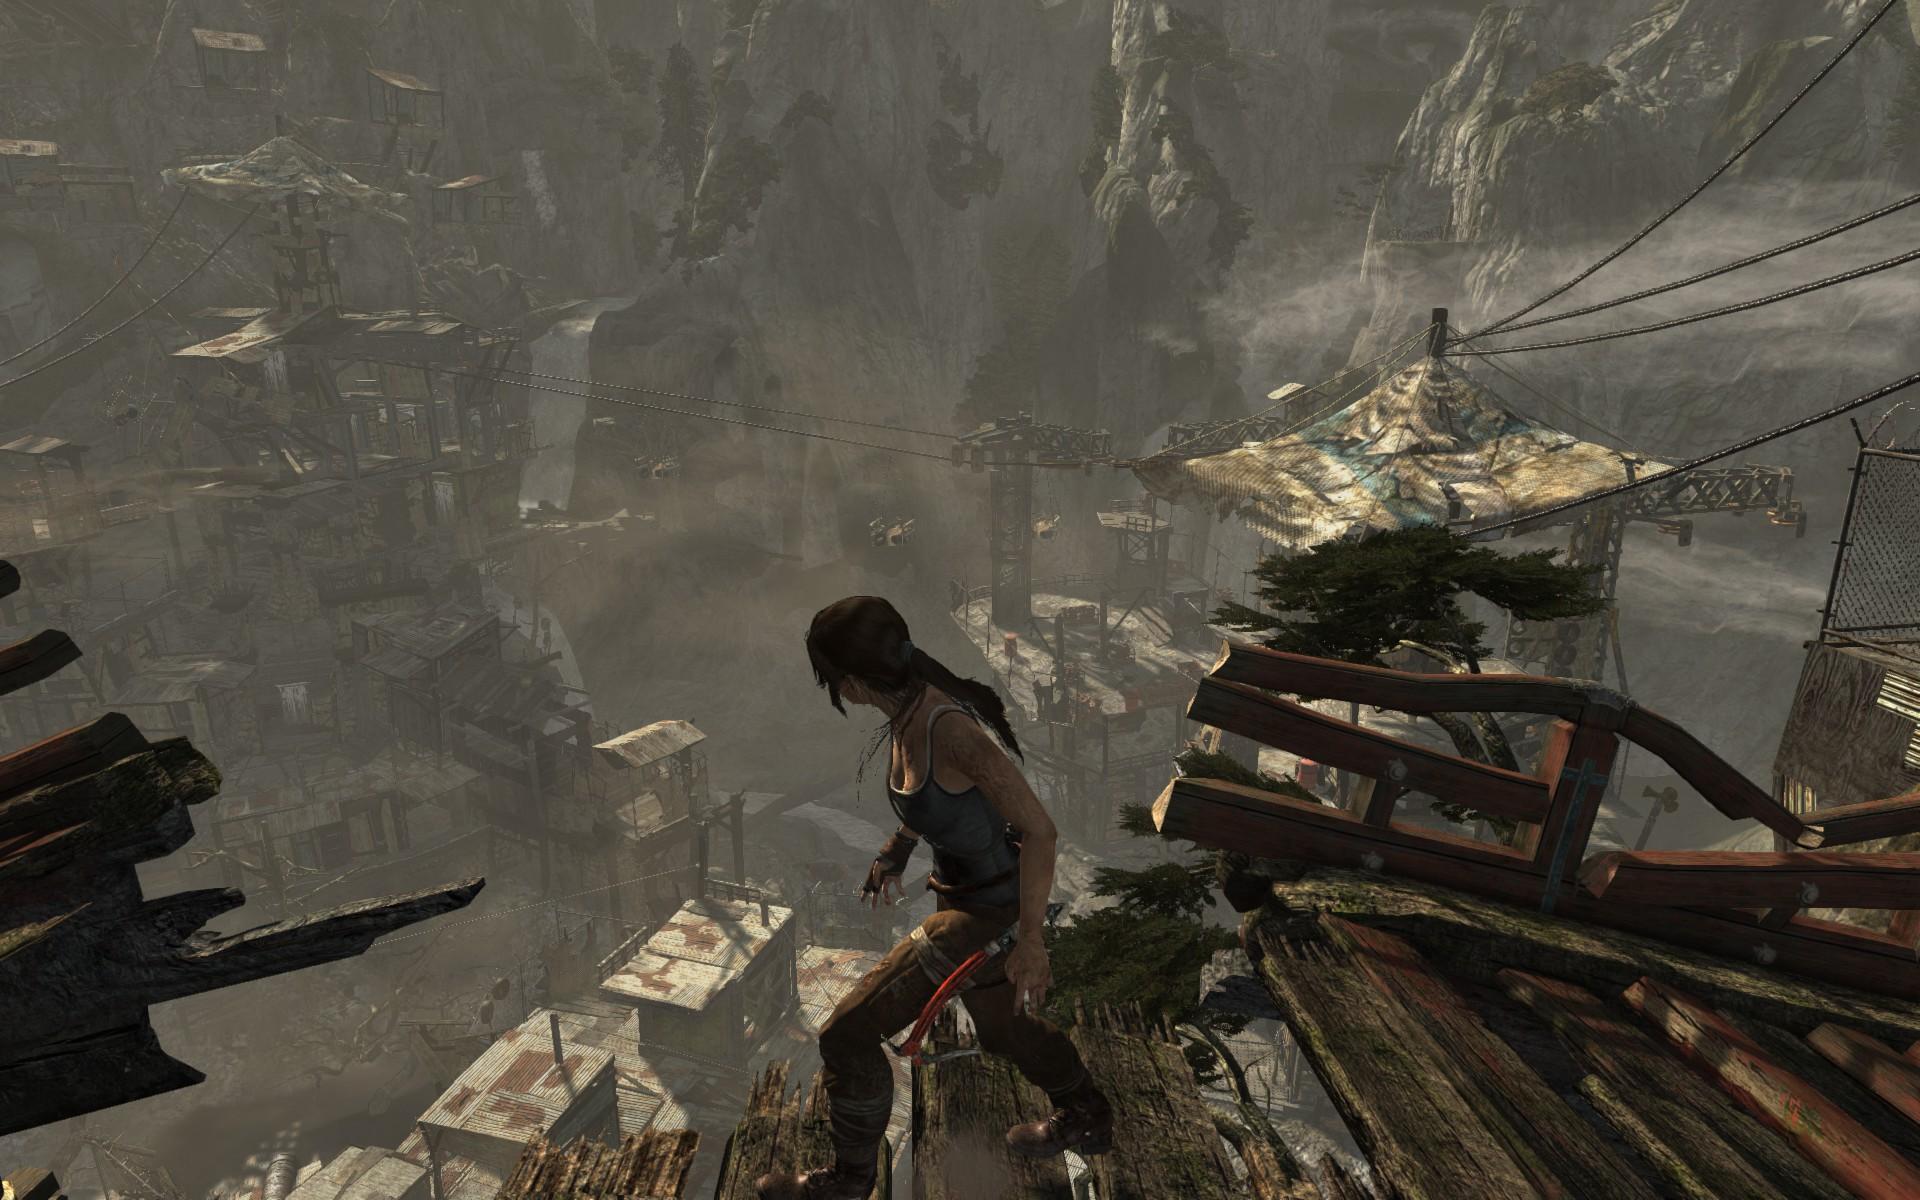 Tomb_Raider_bidonvilles